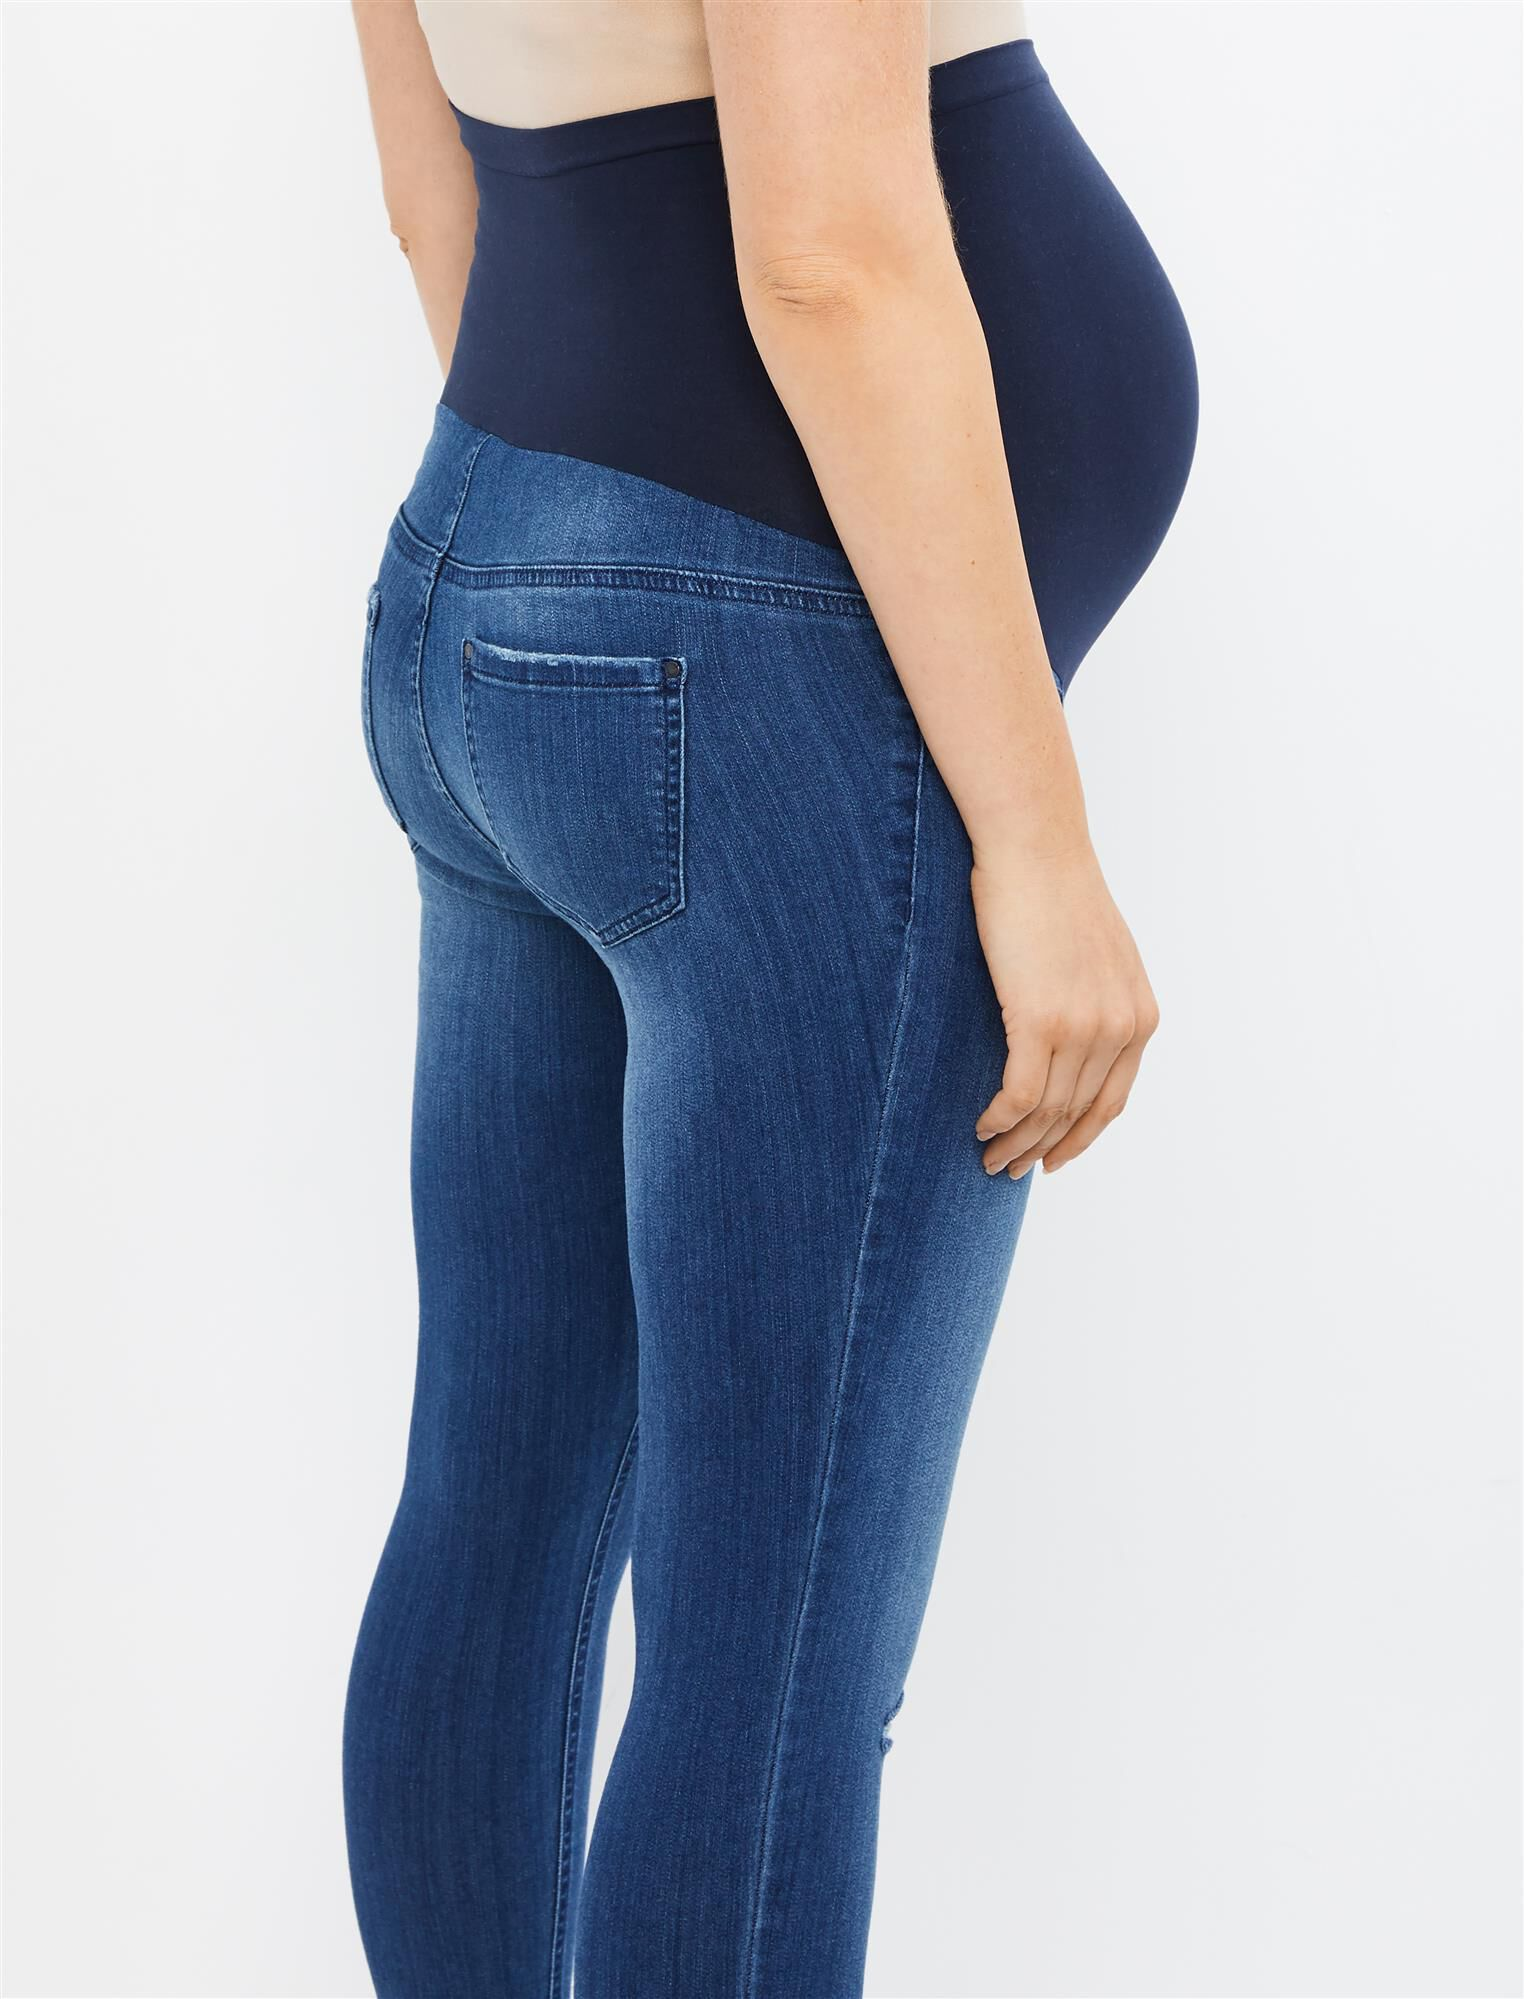 Motherhood Maternity Womens Maternity Indigo Blue Stretch Secret Fit Belly Ankle Denim Jegging